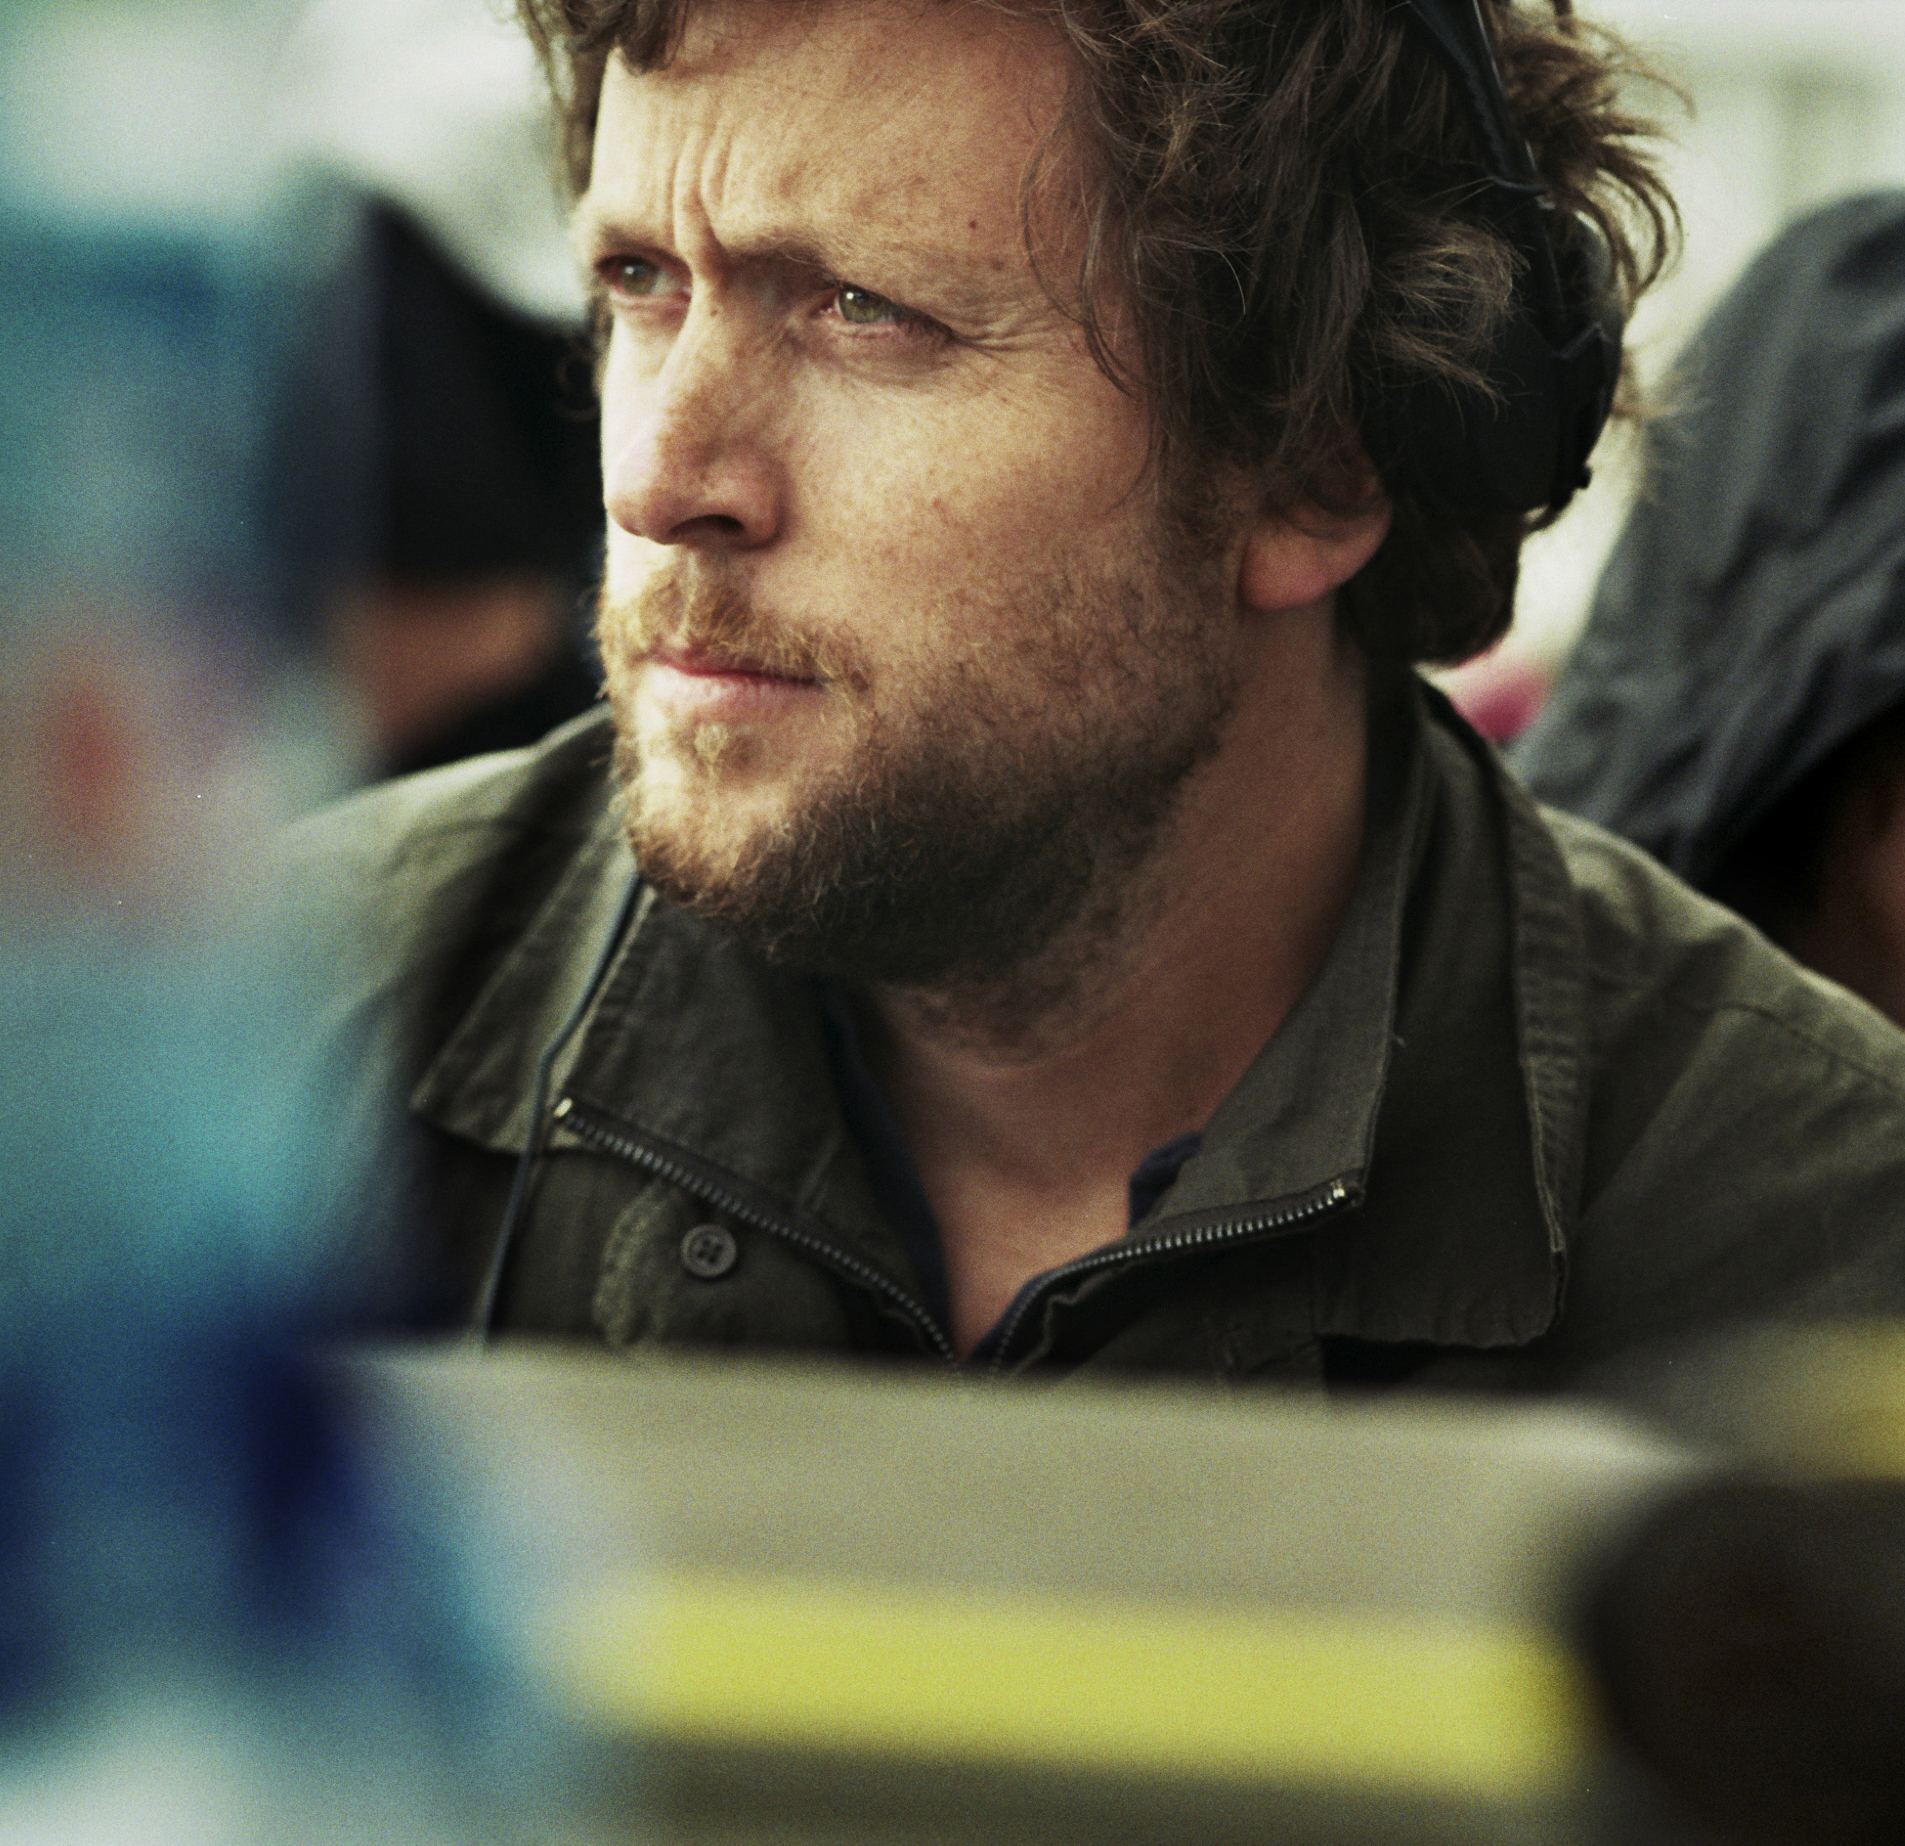 Director Joachim Lafosse